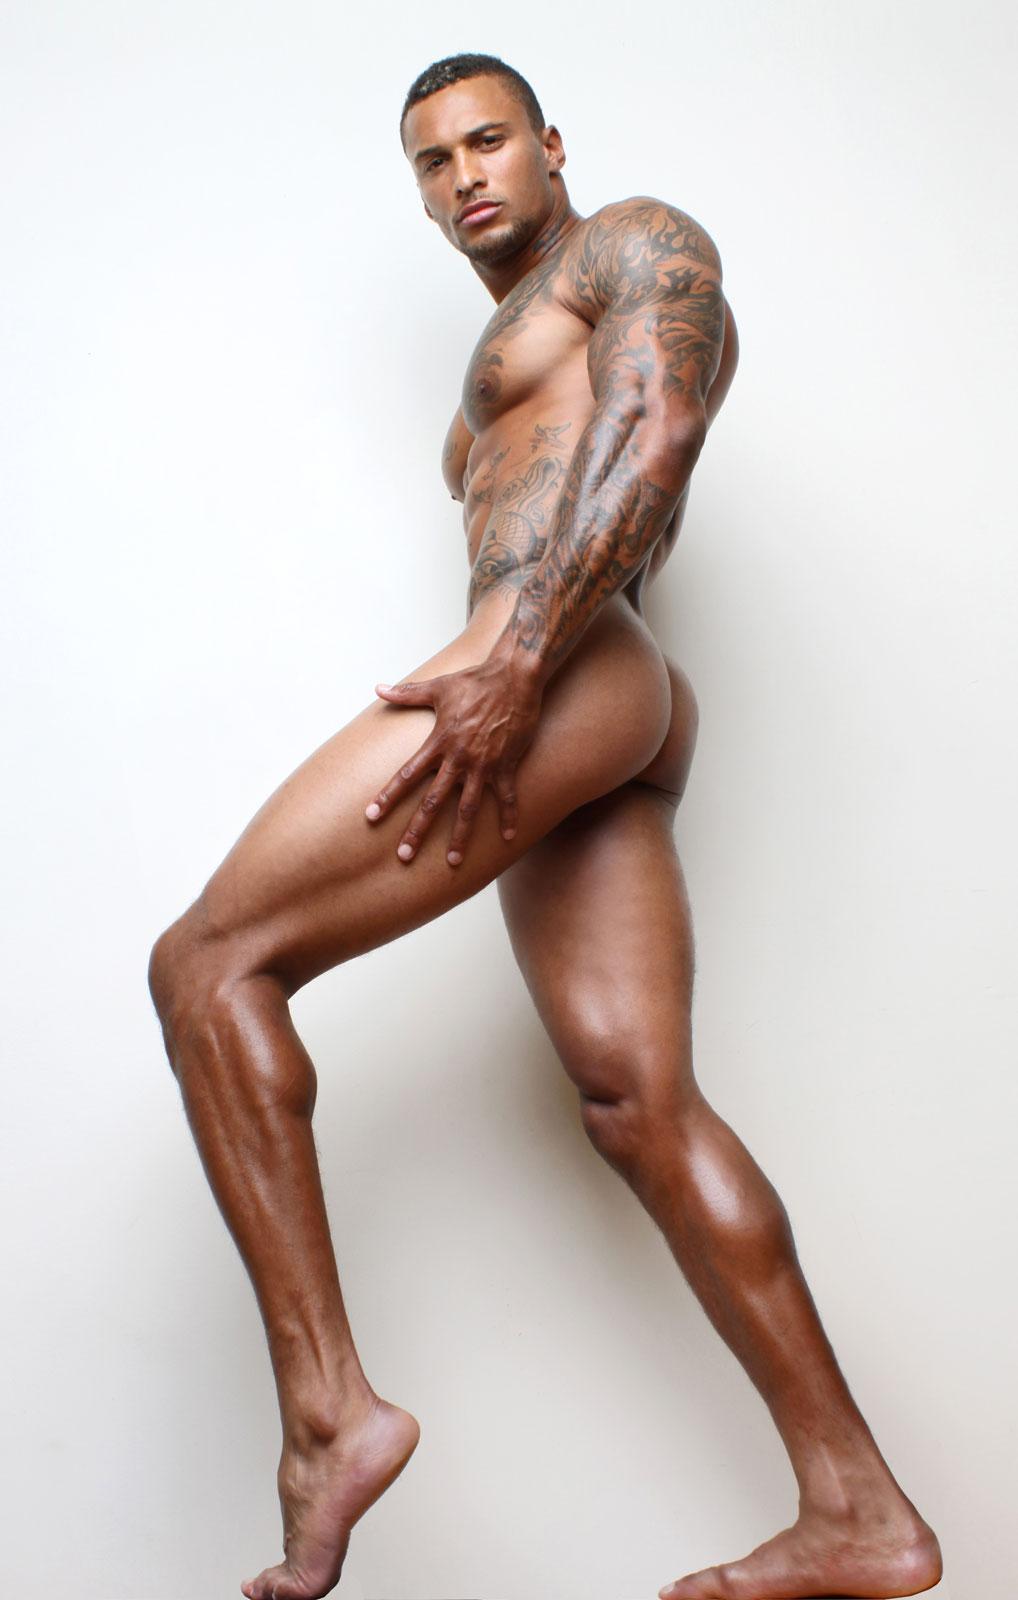 Carl korbin gay photo